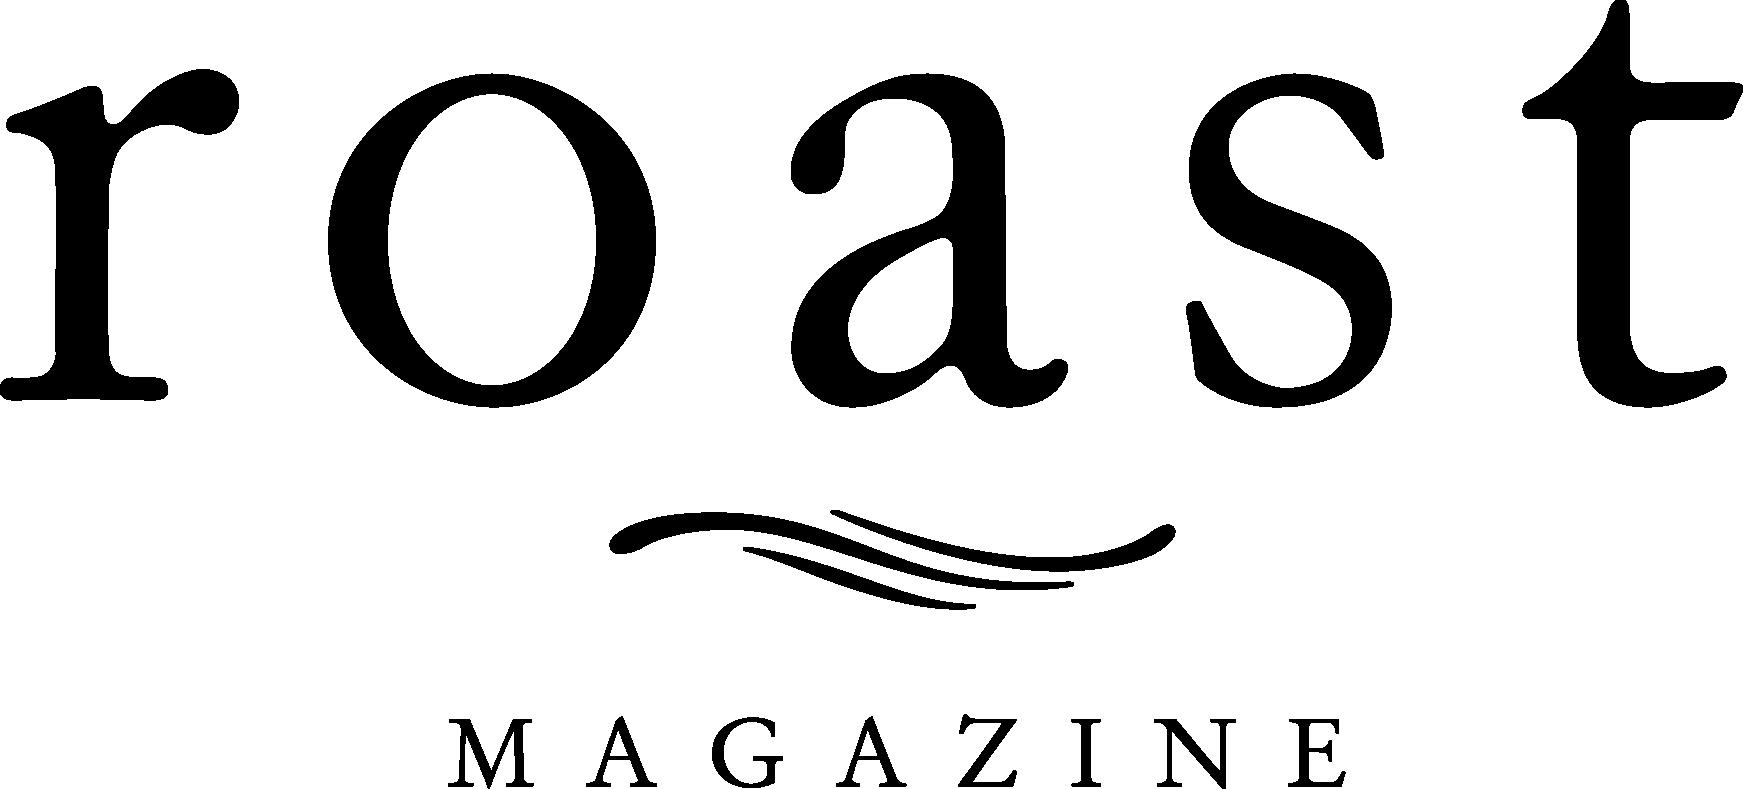 Roast Magazine_061217.png